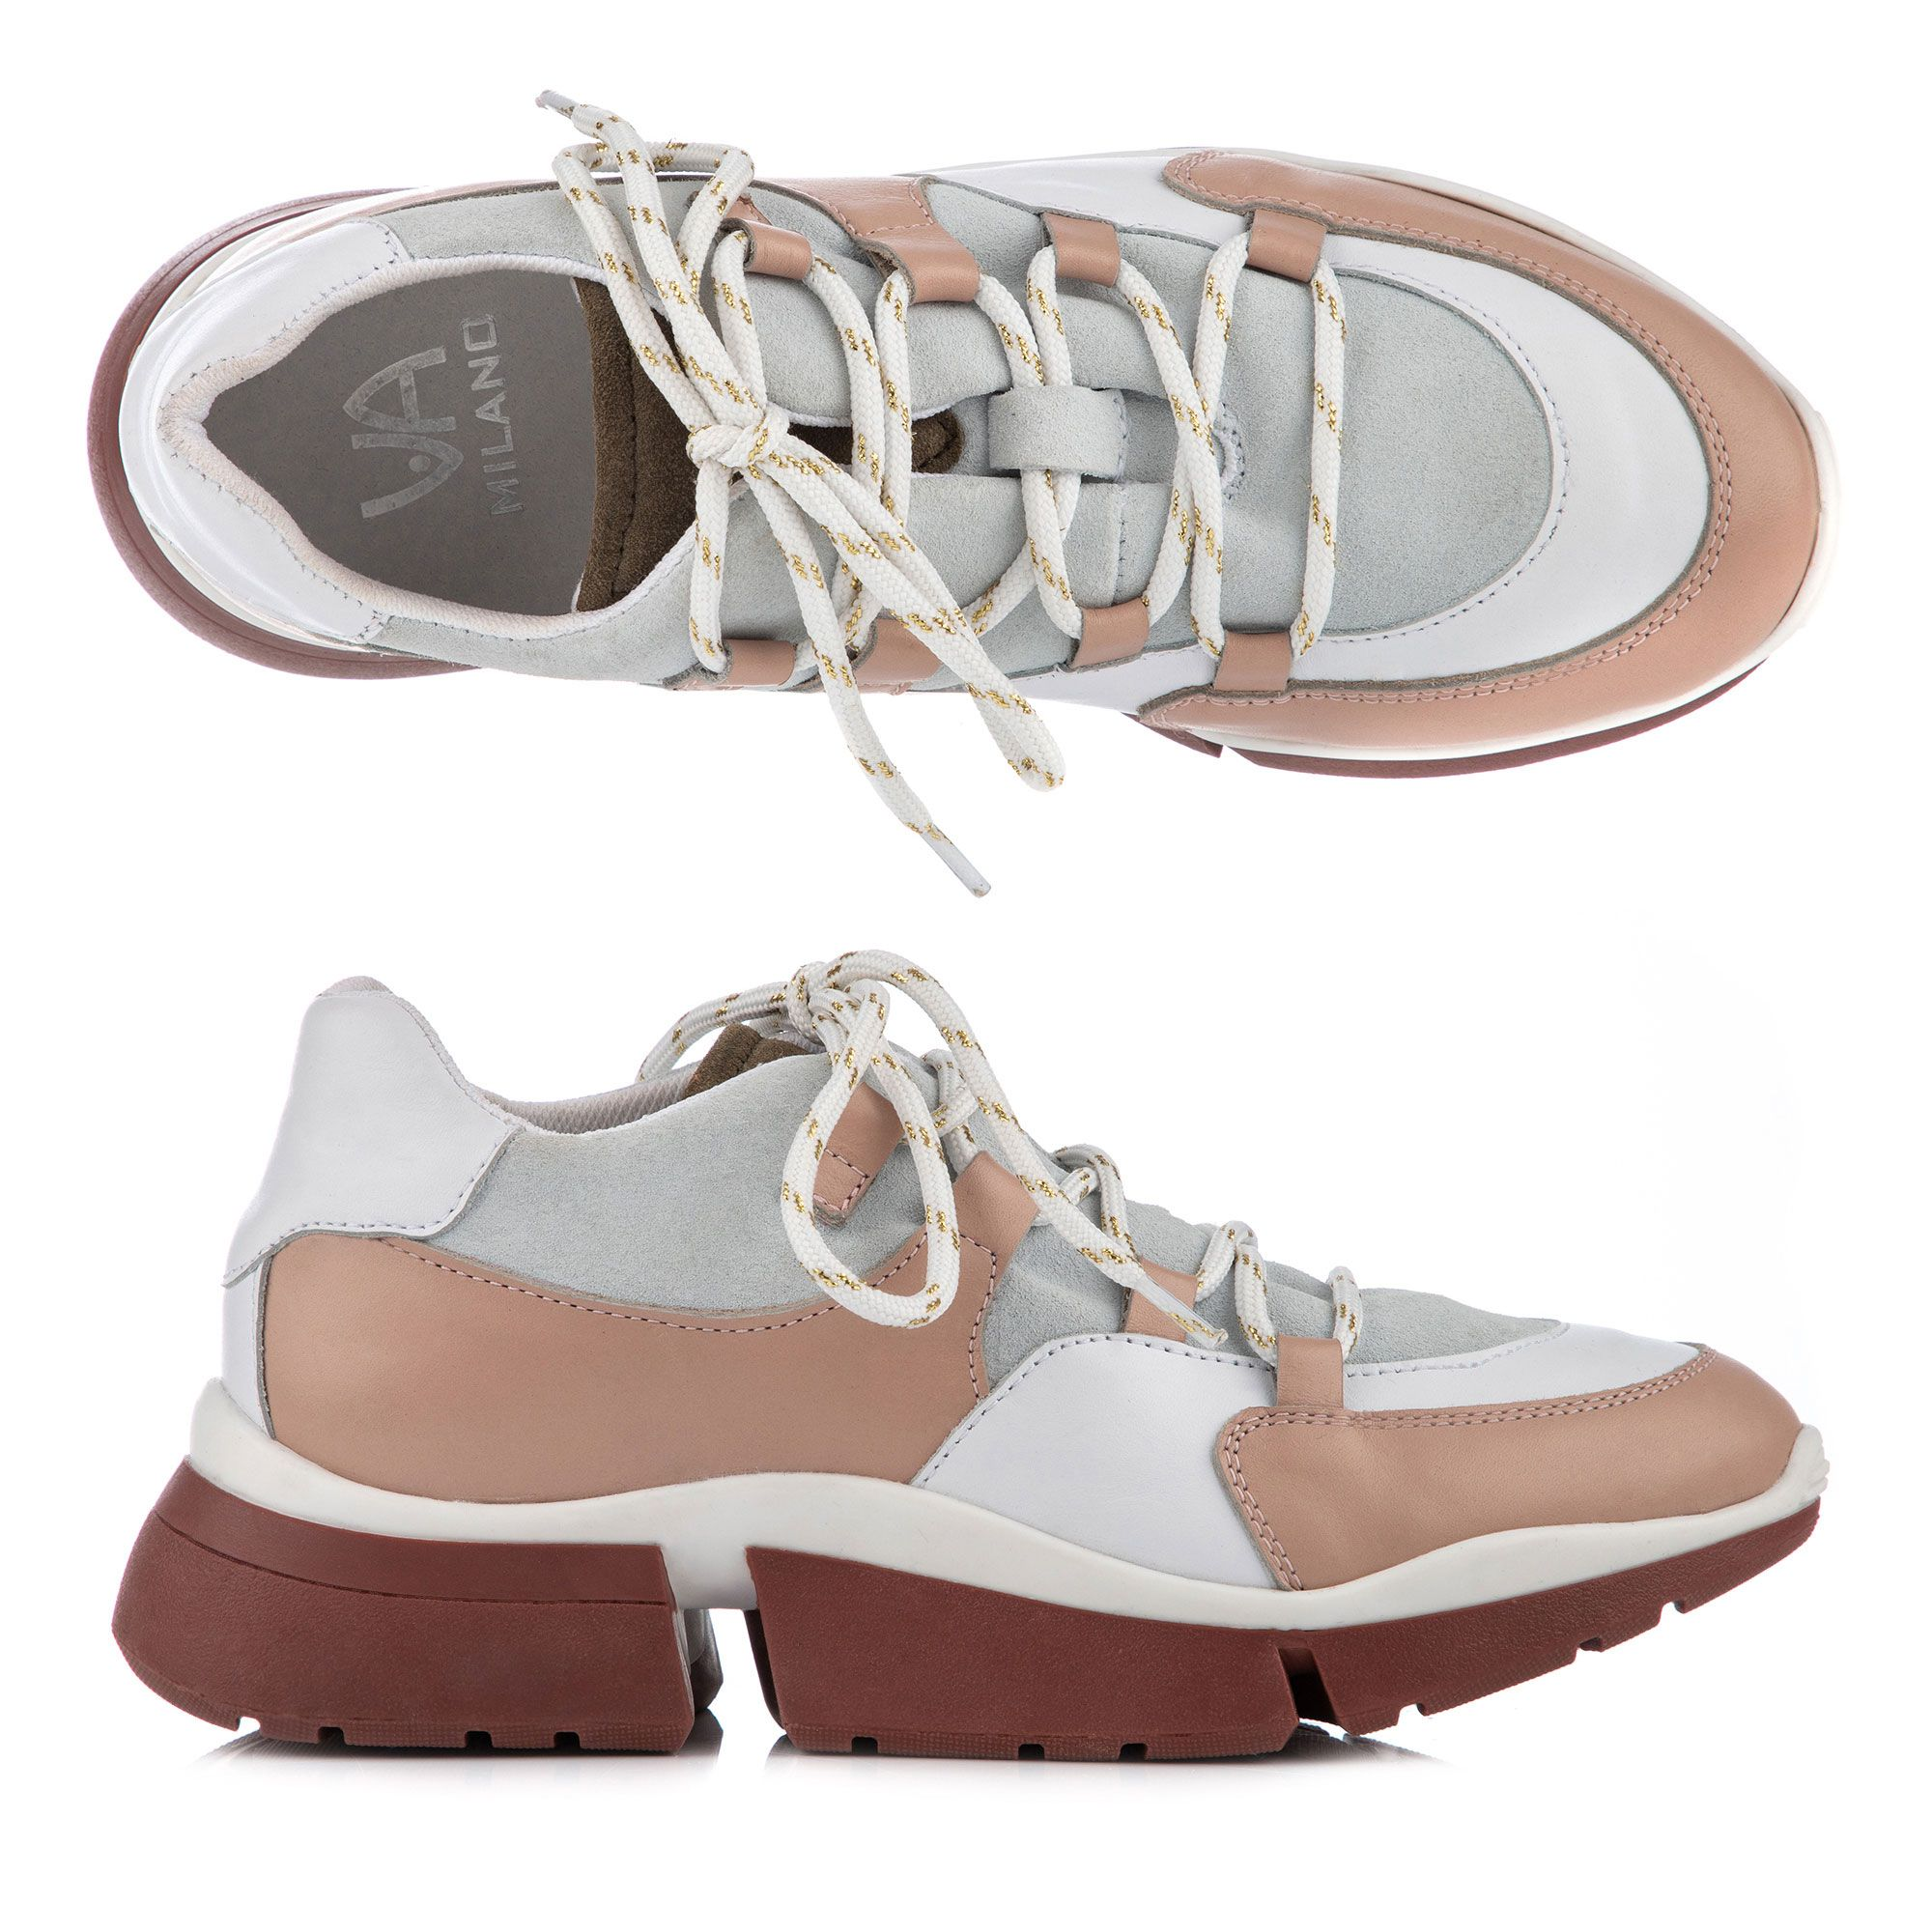 VIA MILANO Damen Sneaker Leder Schnürung 2 farbige Sohle —